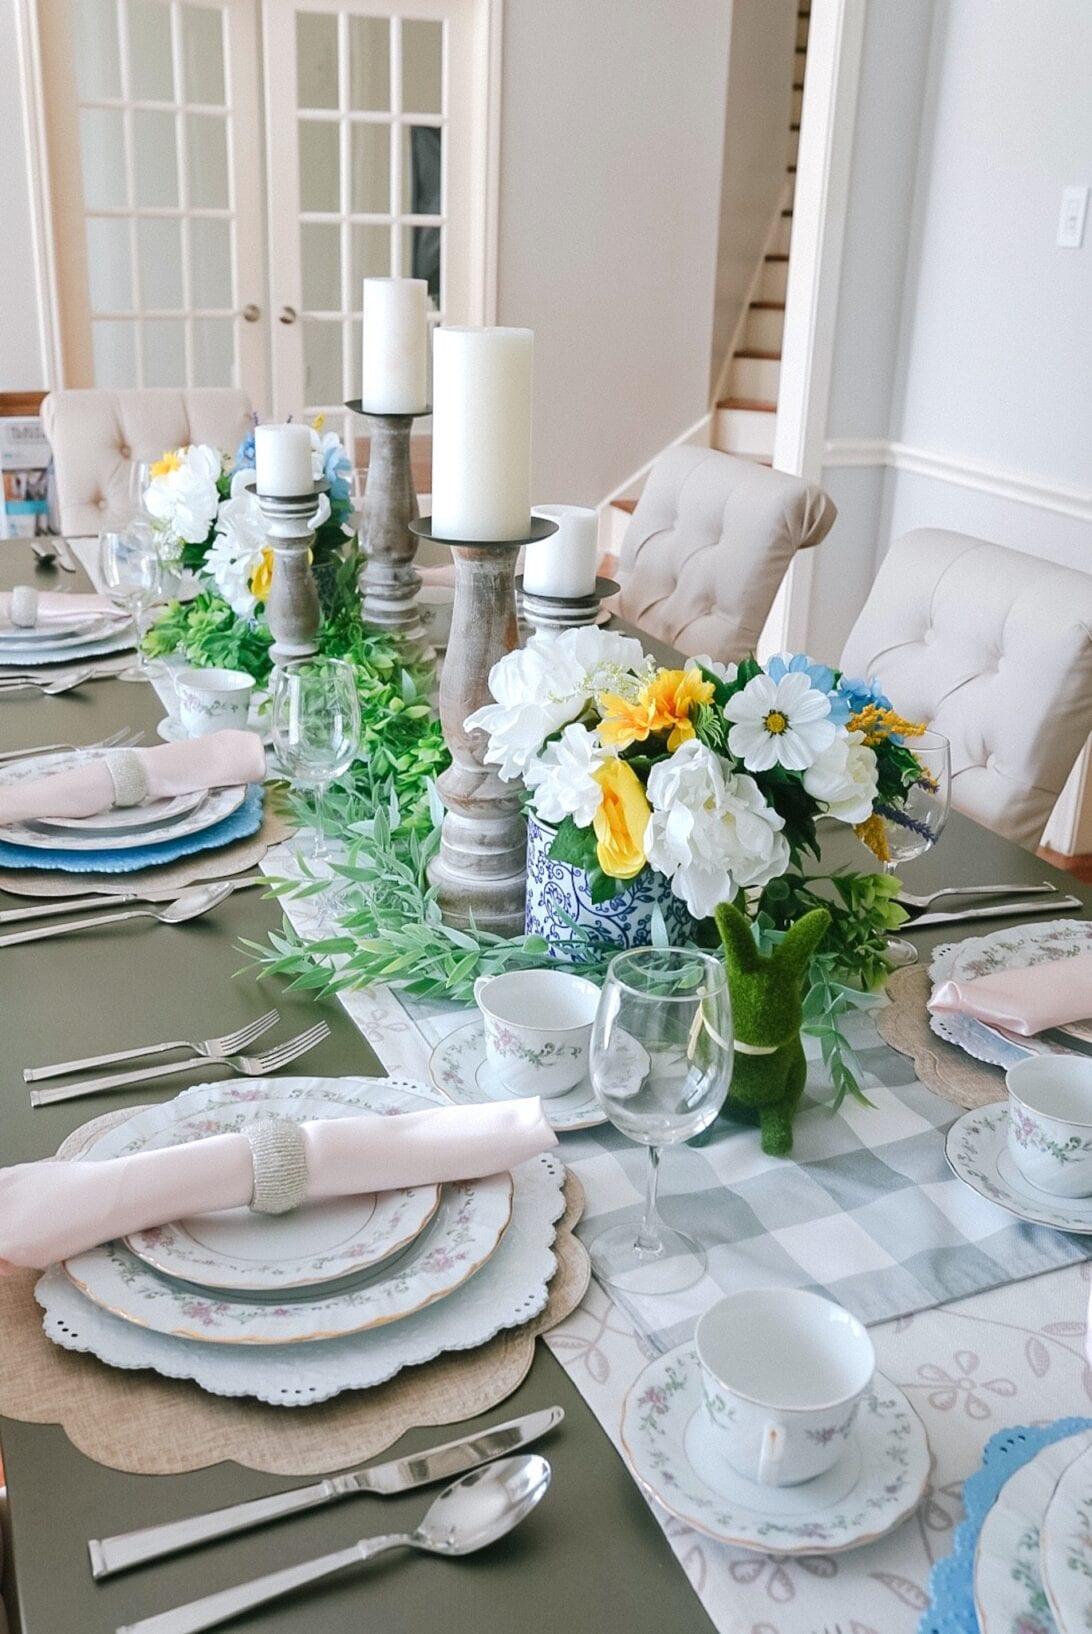 table setting, Easter table setting, floral table setting, tablescape, china dinnerware, napkins, tea set